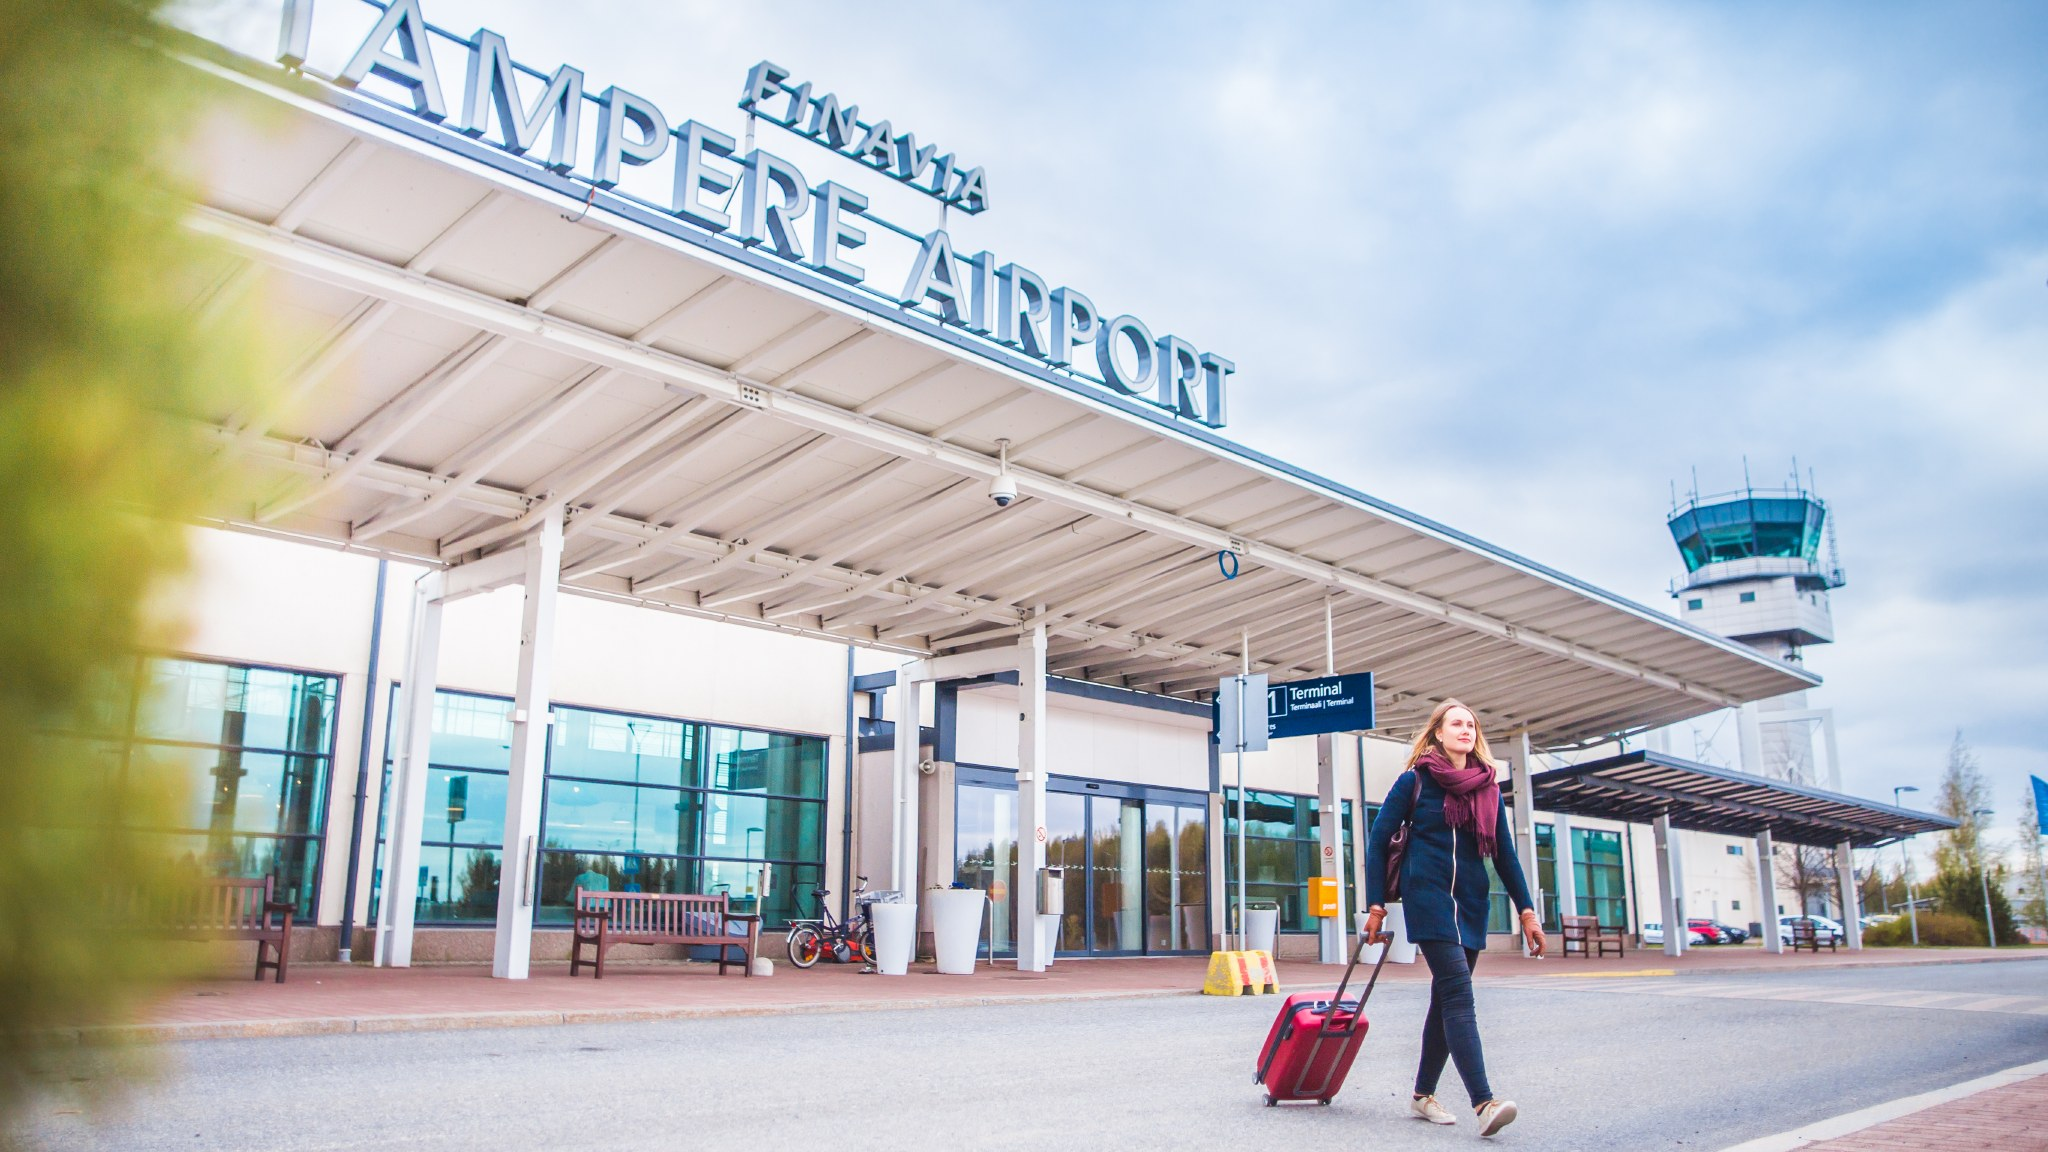 Visit Tampere Airport Tampere Pirkkala lentoasema Laura Vanzo 16 2